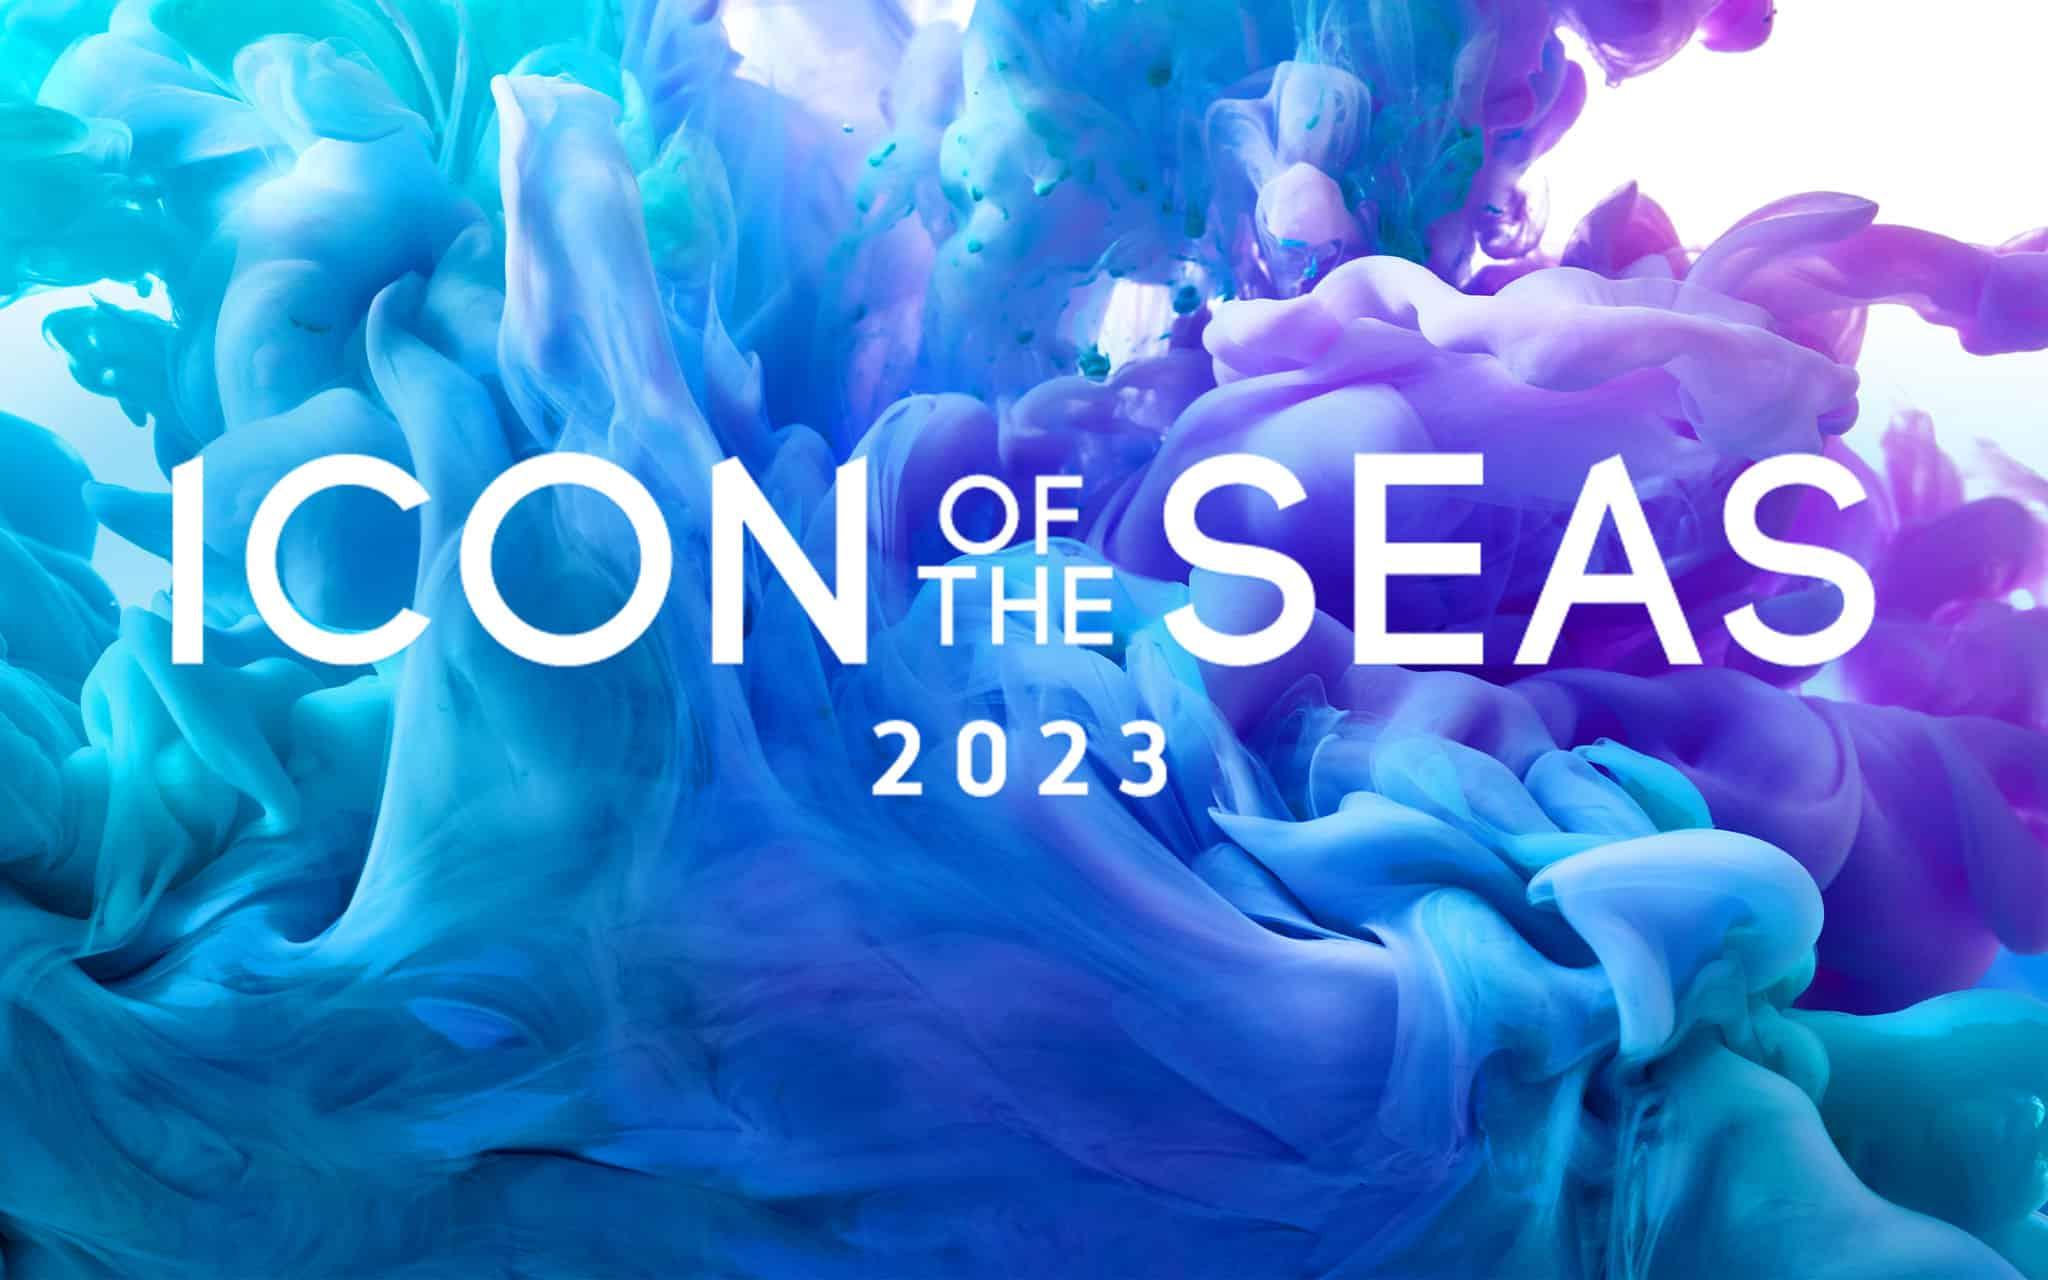 Icon of the Seas - начало строительство нового лайнера Royal Caribbean